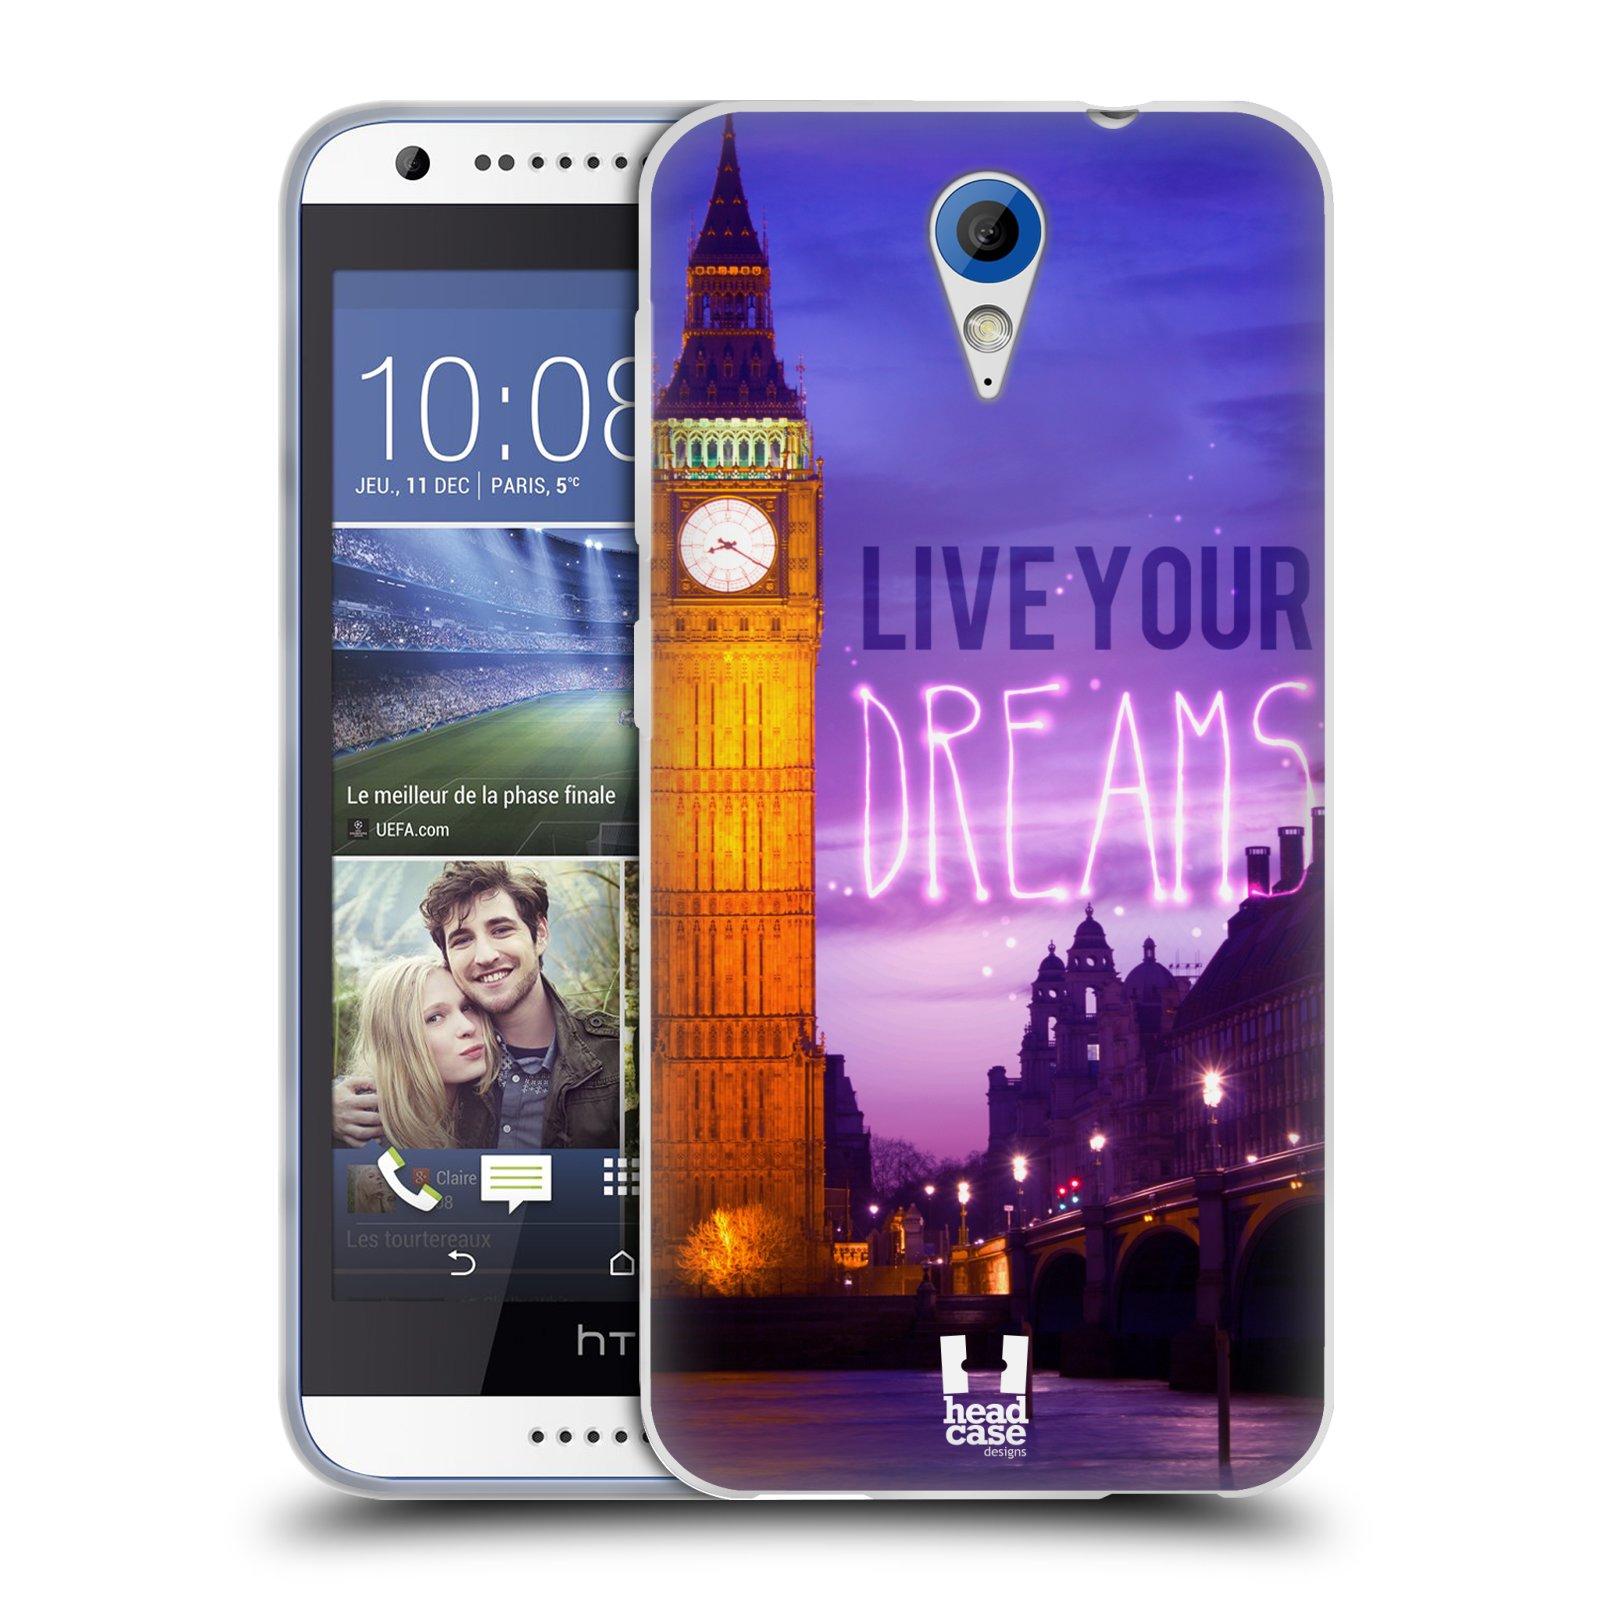 Silikonové pouzdro na mobil HTC Desire 620 HEAD CASE DREAMS (Silikonový kryt či obal na mobilní telefon HTC Desire 620)